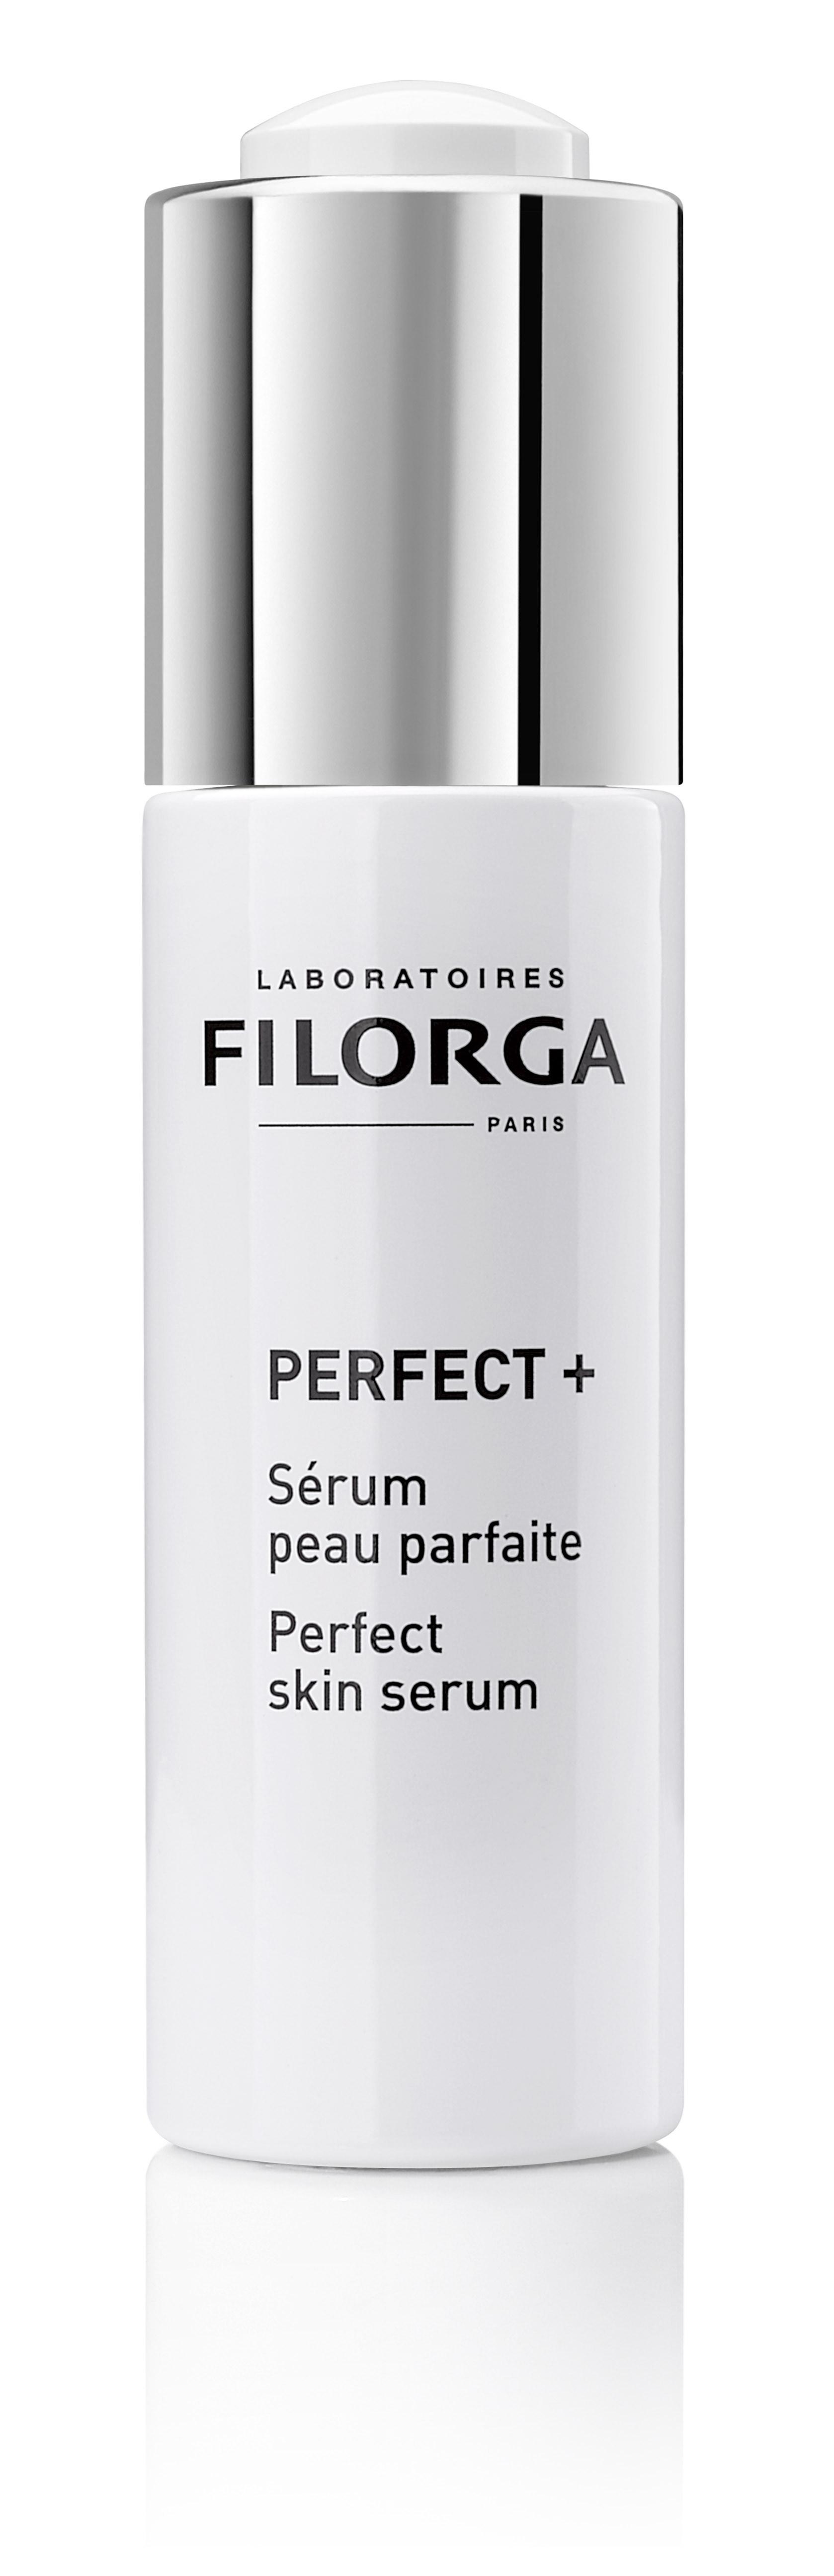 ФИЛОРГА Серум за перфектна кожа 30мл   FILORGA PERFECT+ Perfect skin serum 30ml